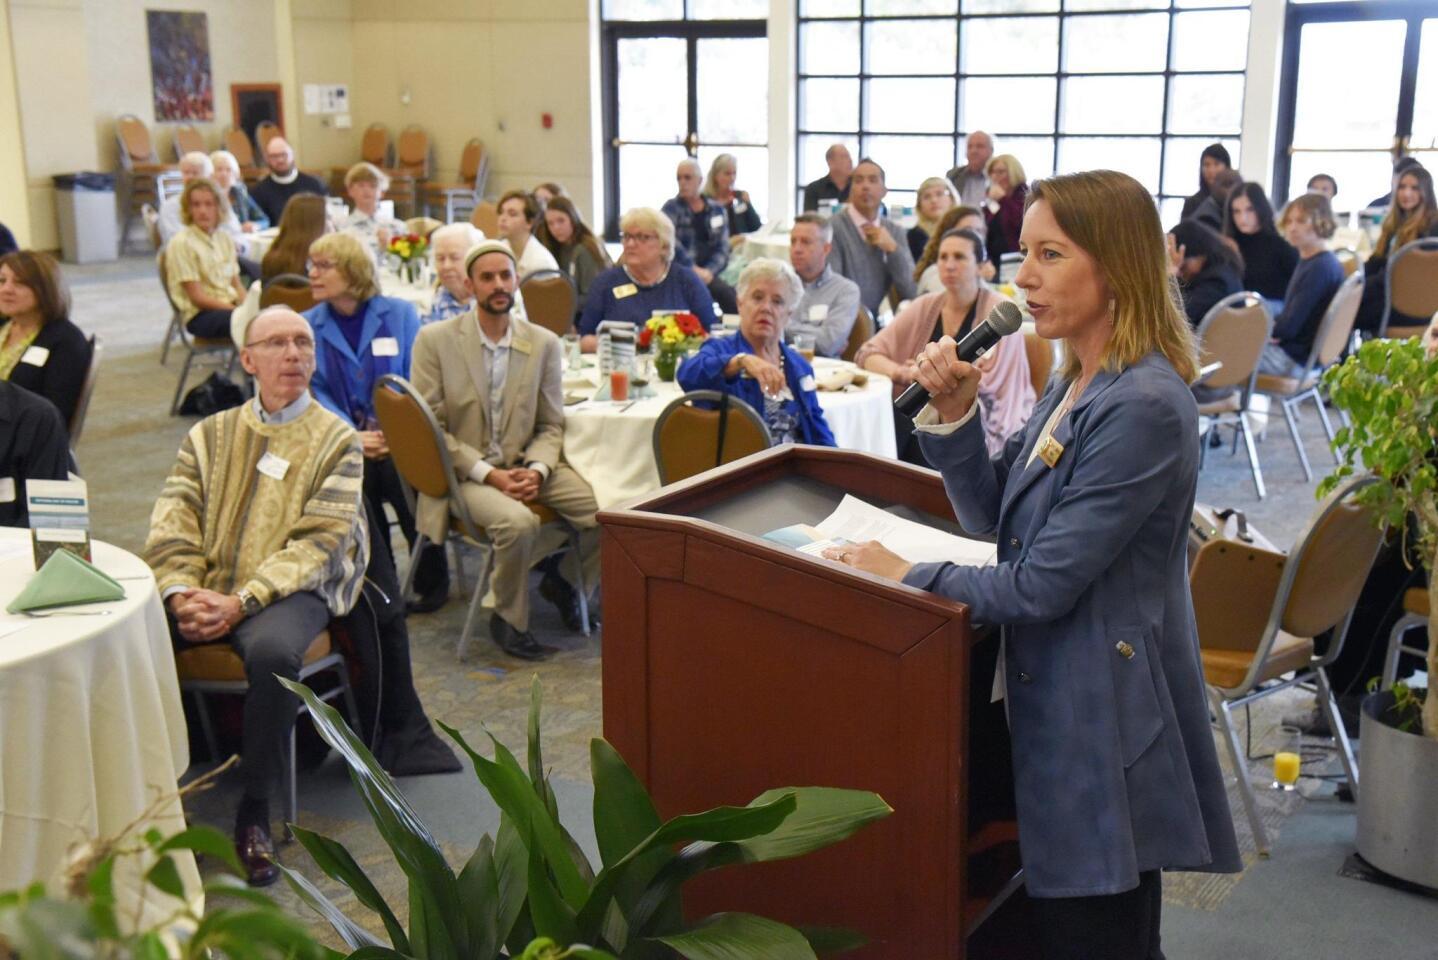 26th Annual Interfaith Community Prayer Breakfast